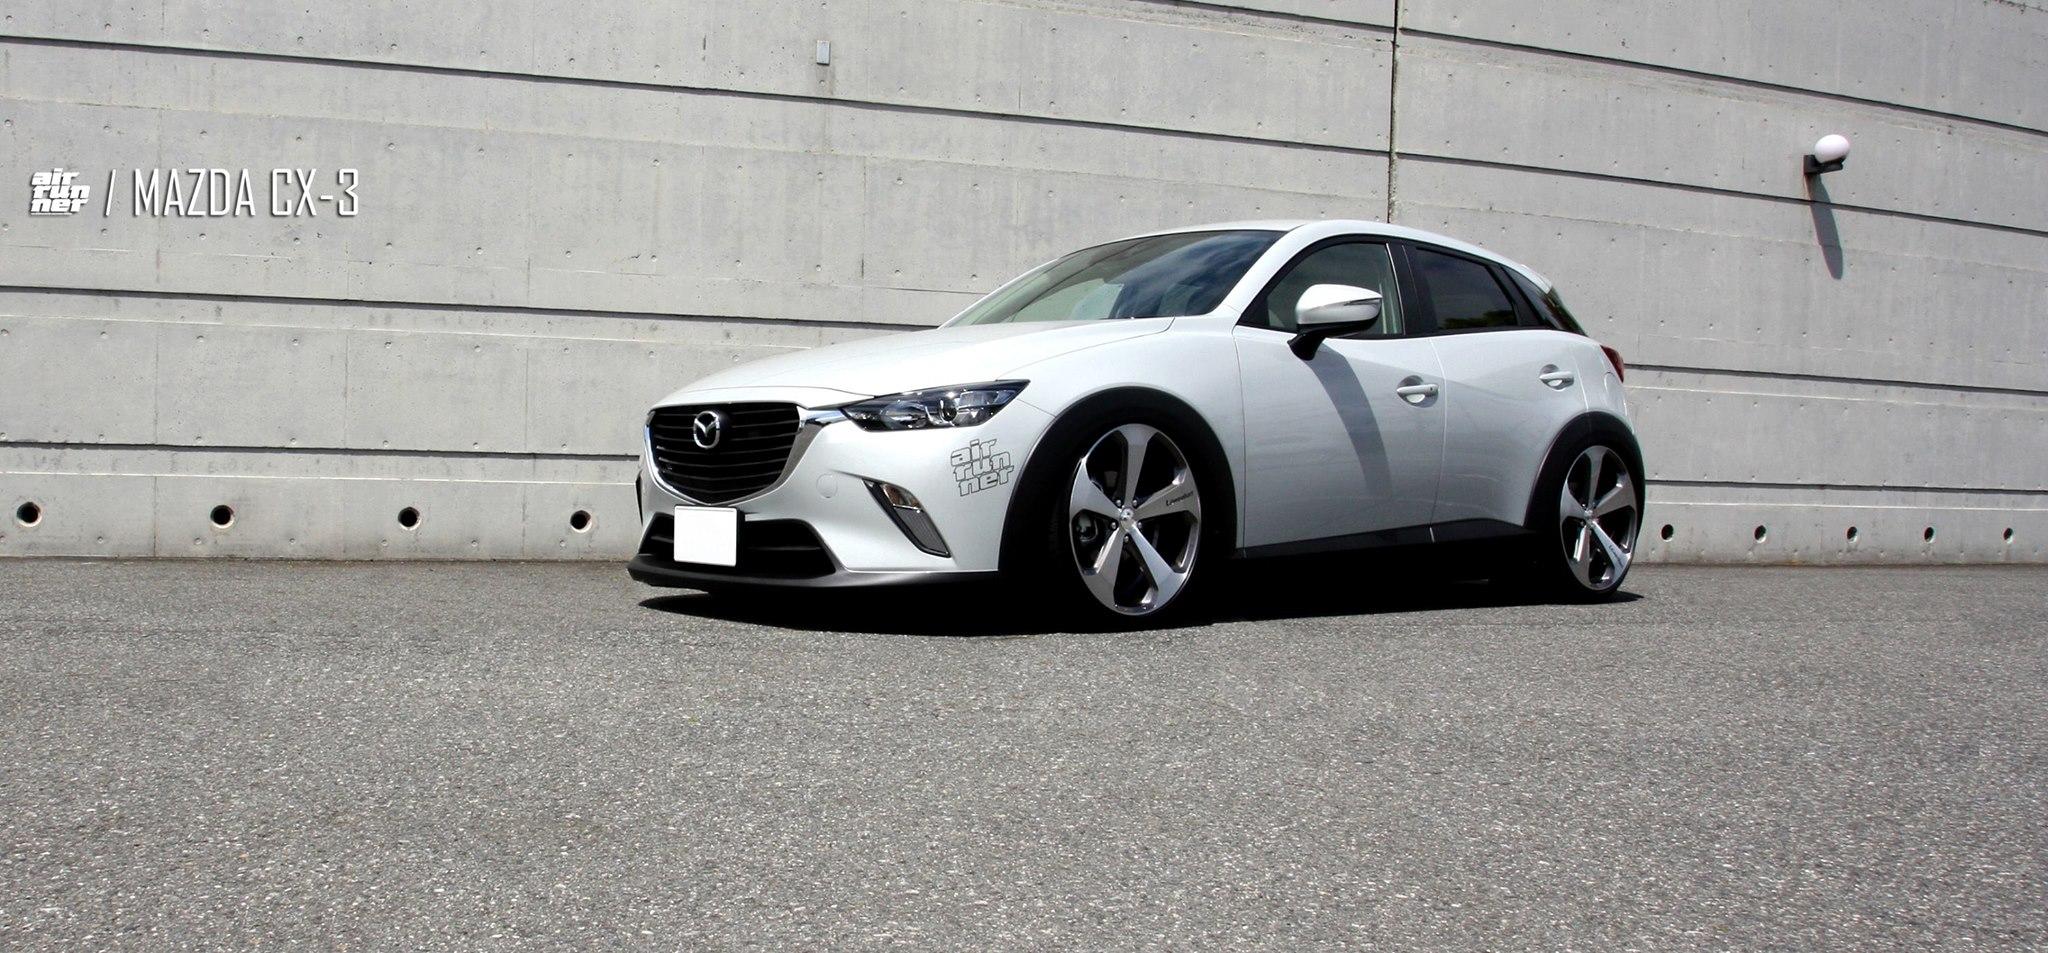 Mazda Cx 3 Air Runner Namasce